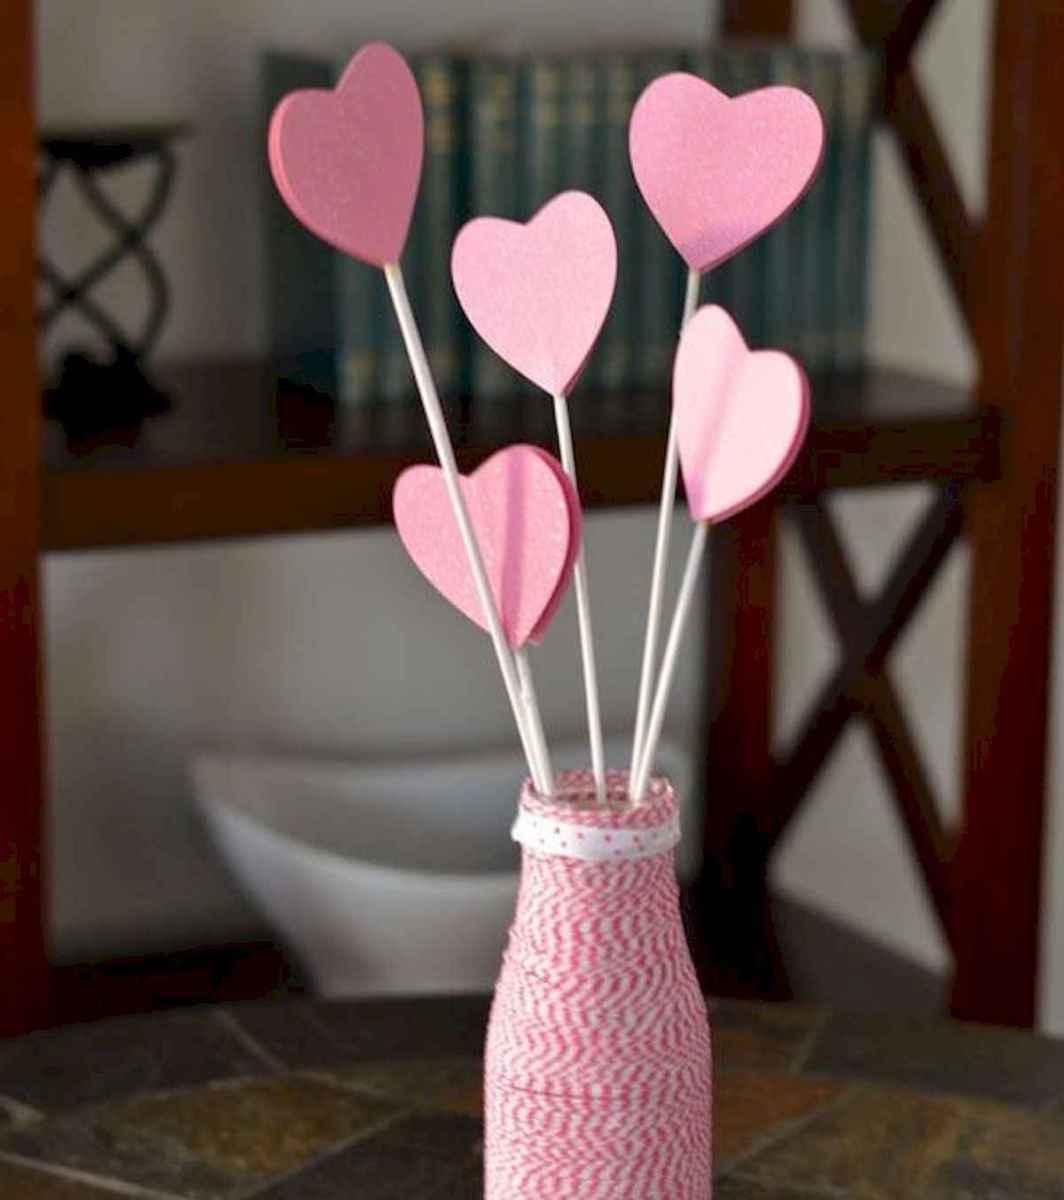 75 Romantic Valentines Day Crafts Design Ideas (5)